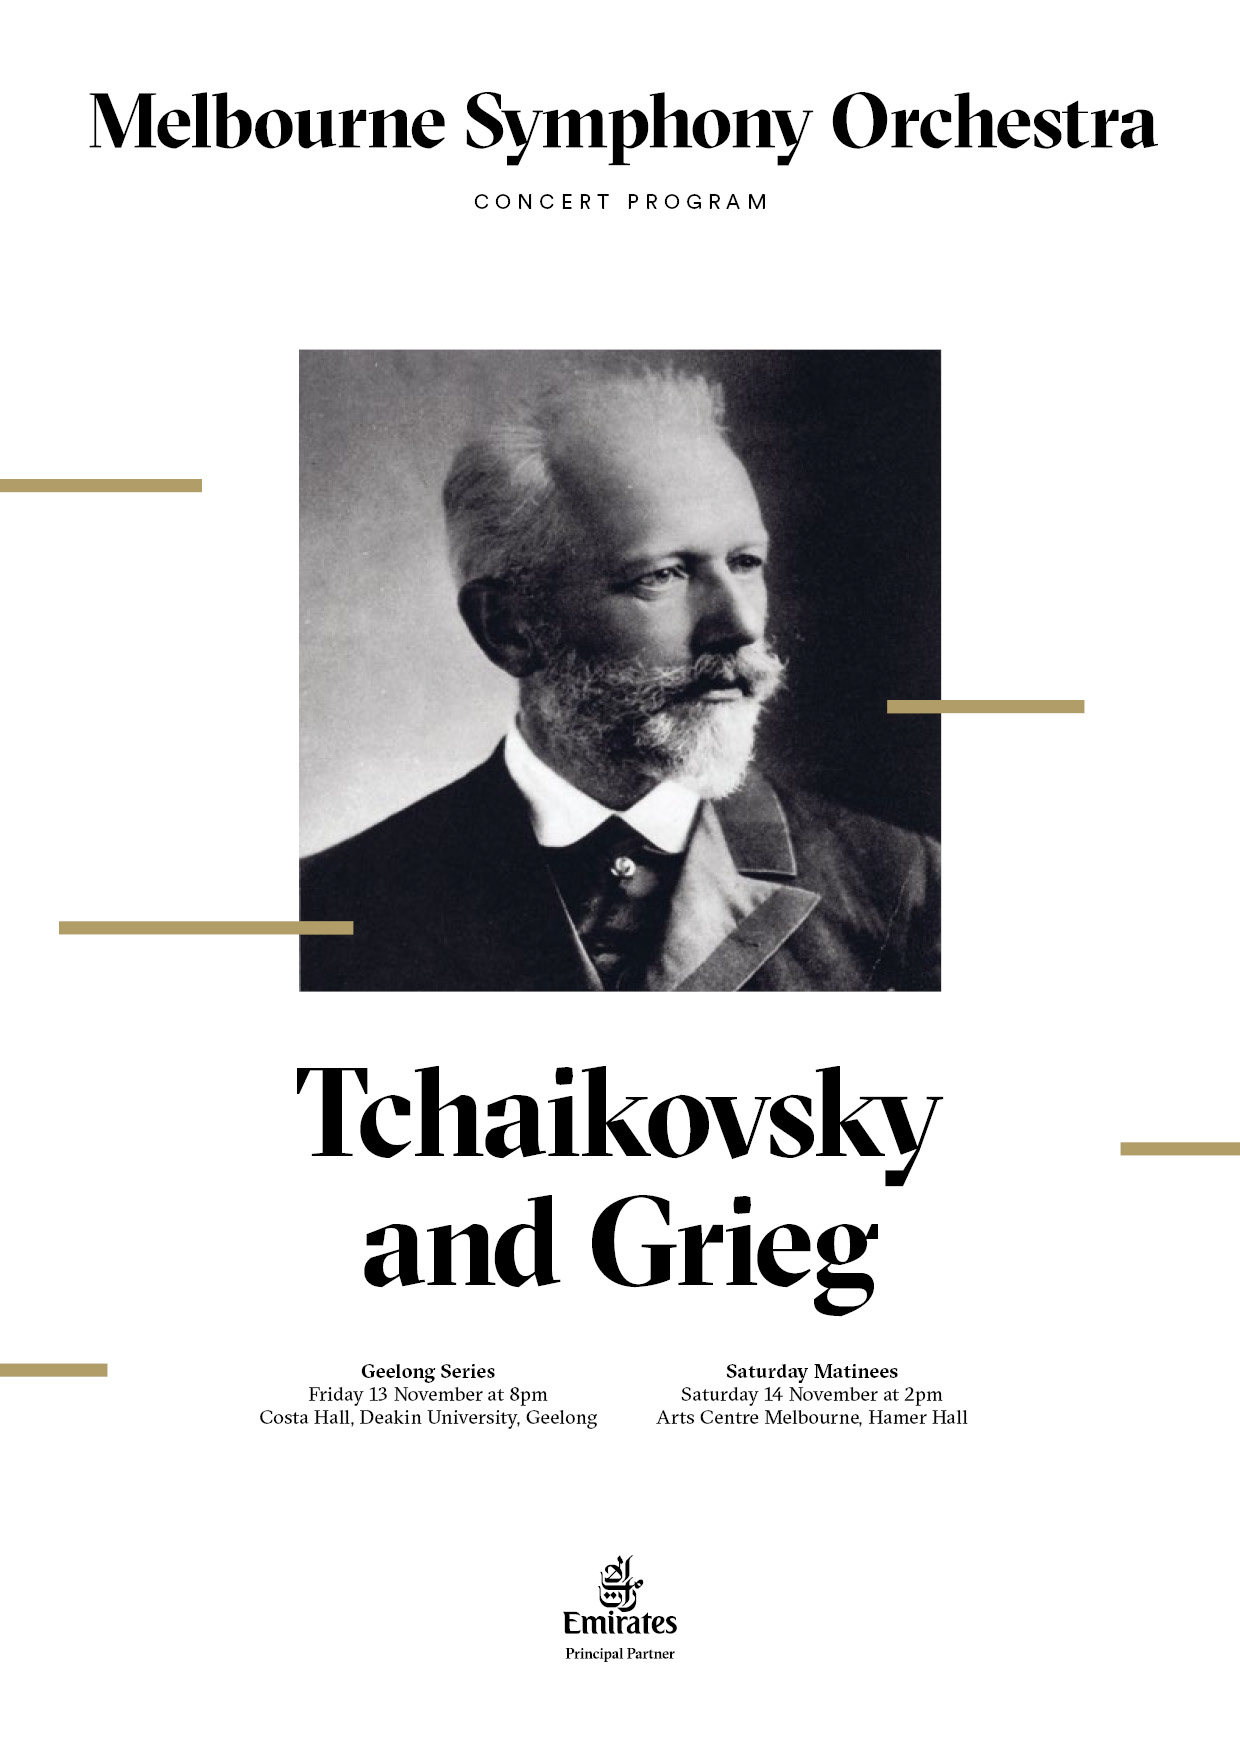 Tchaikovsky and Grieg